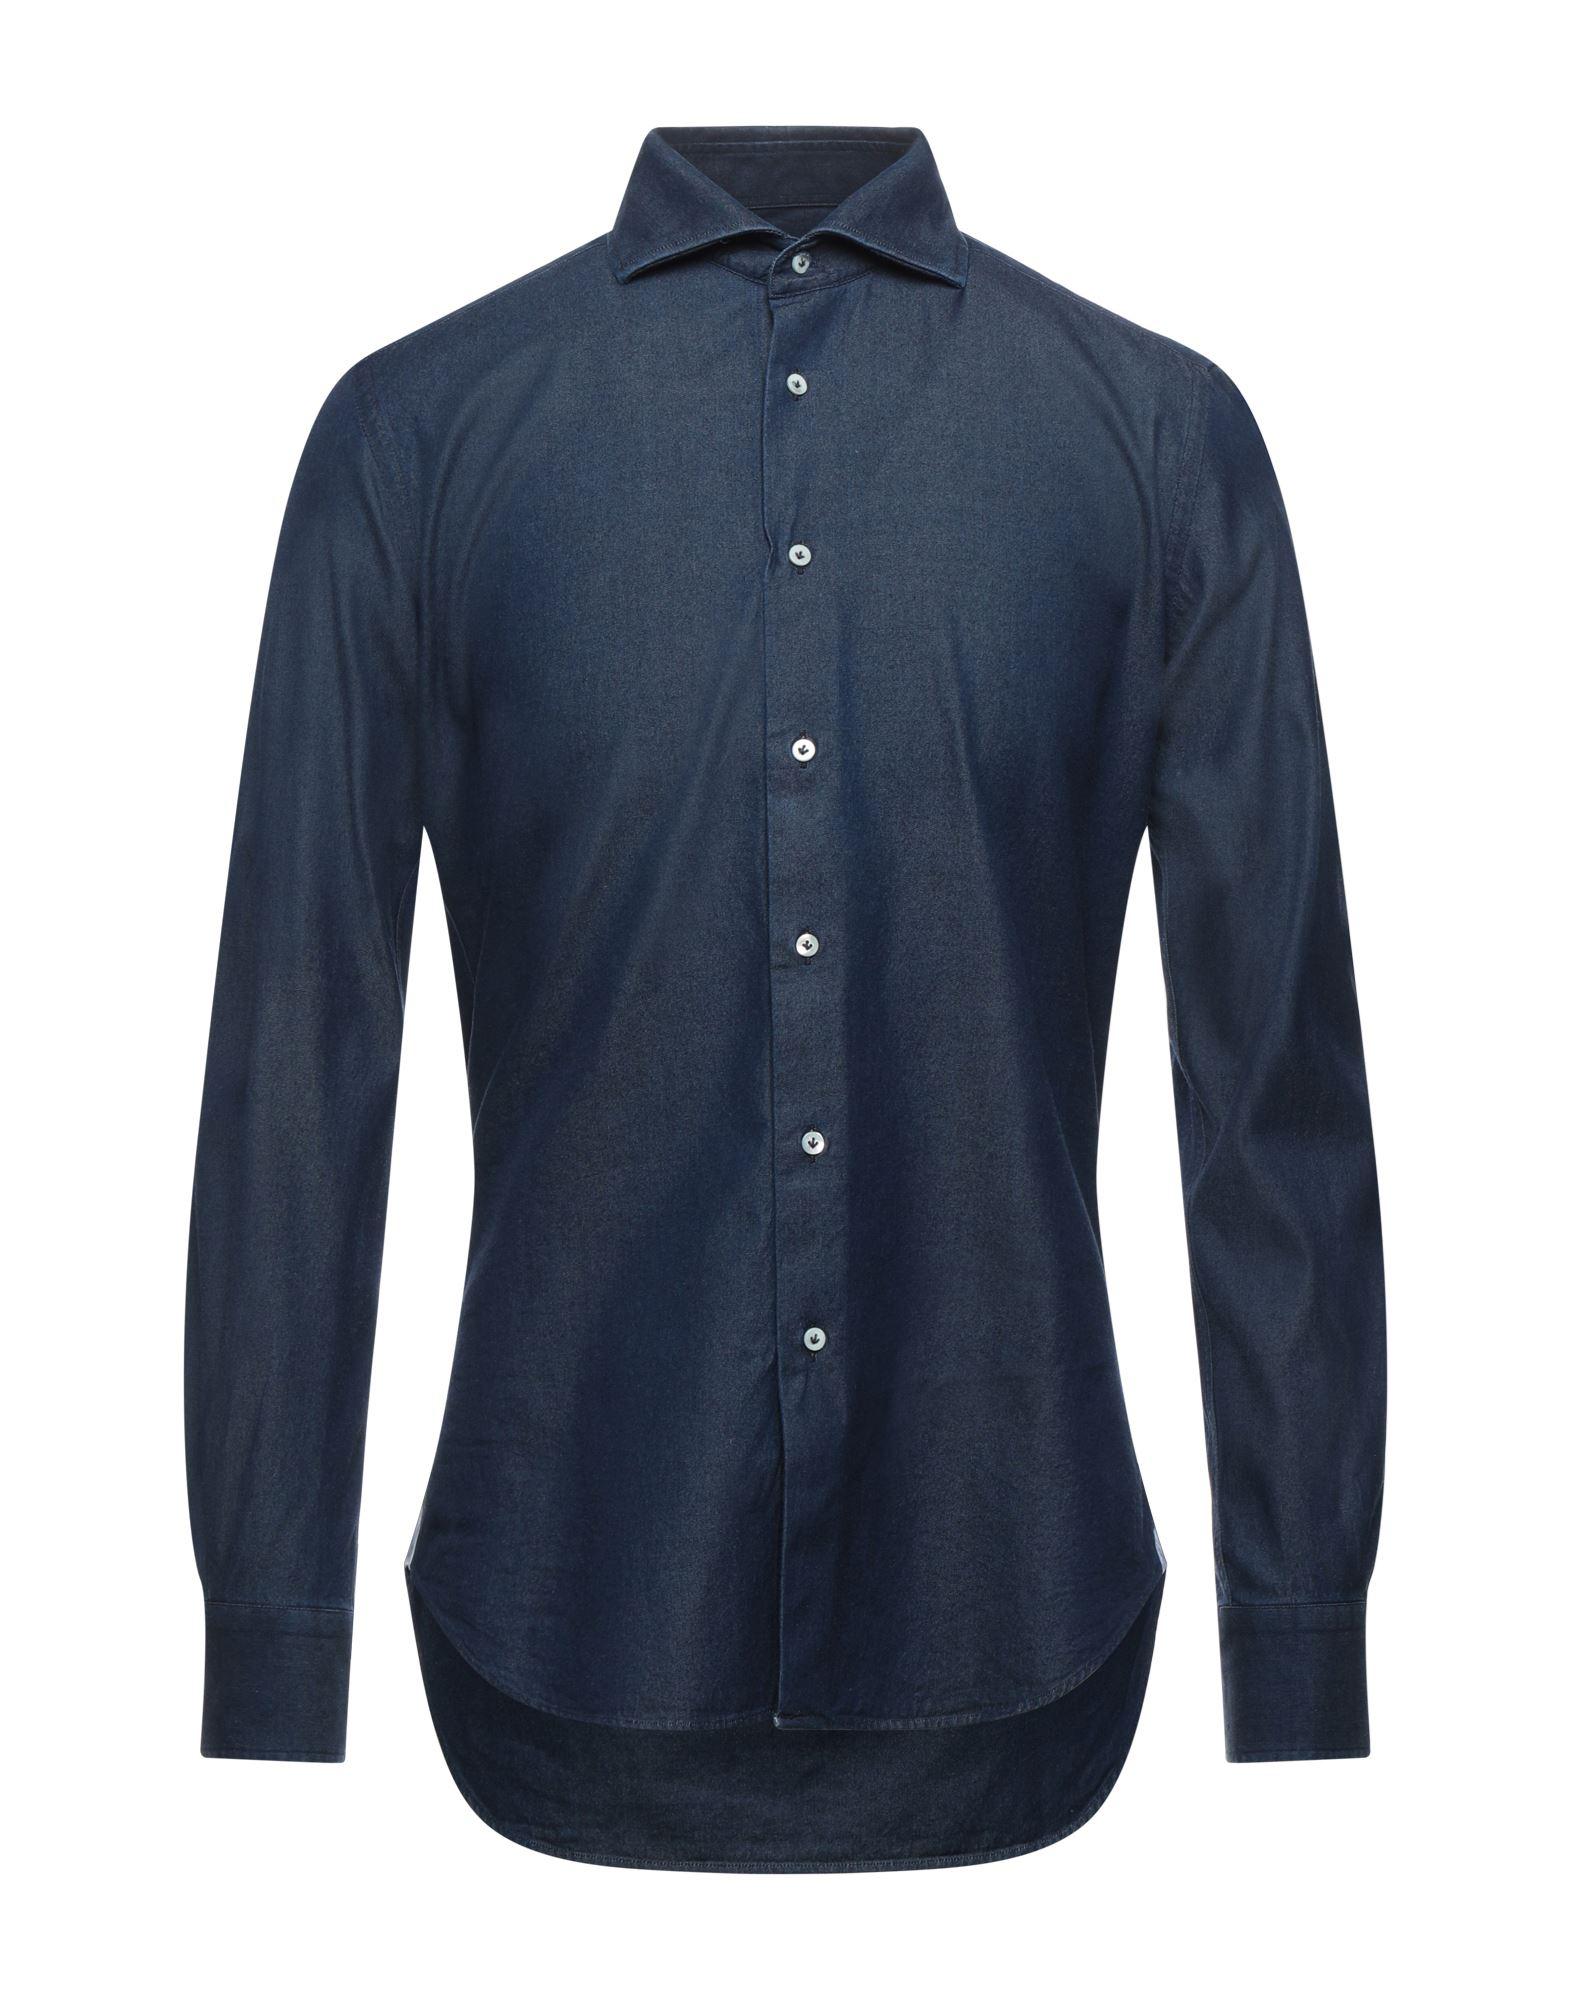 Фото - ALEX INGH Джинсовая рубашка alex ingh pубашка